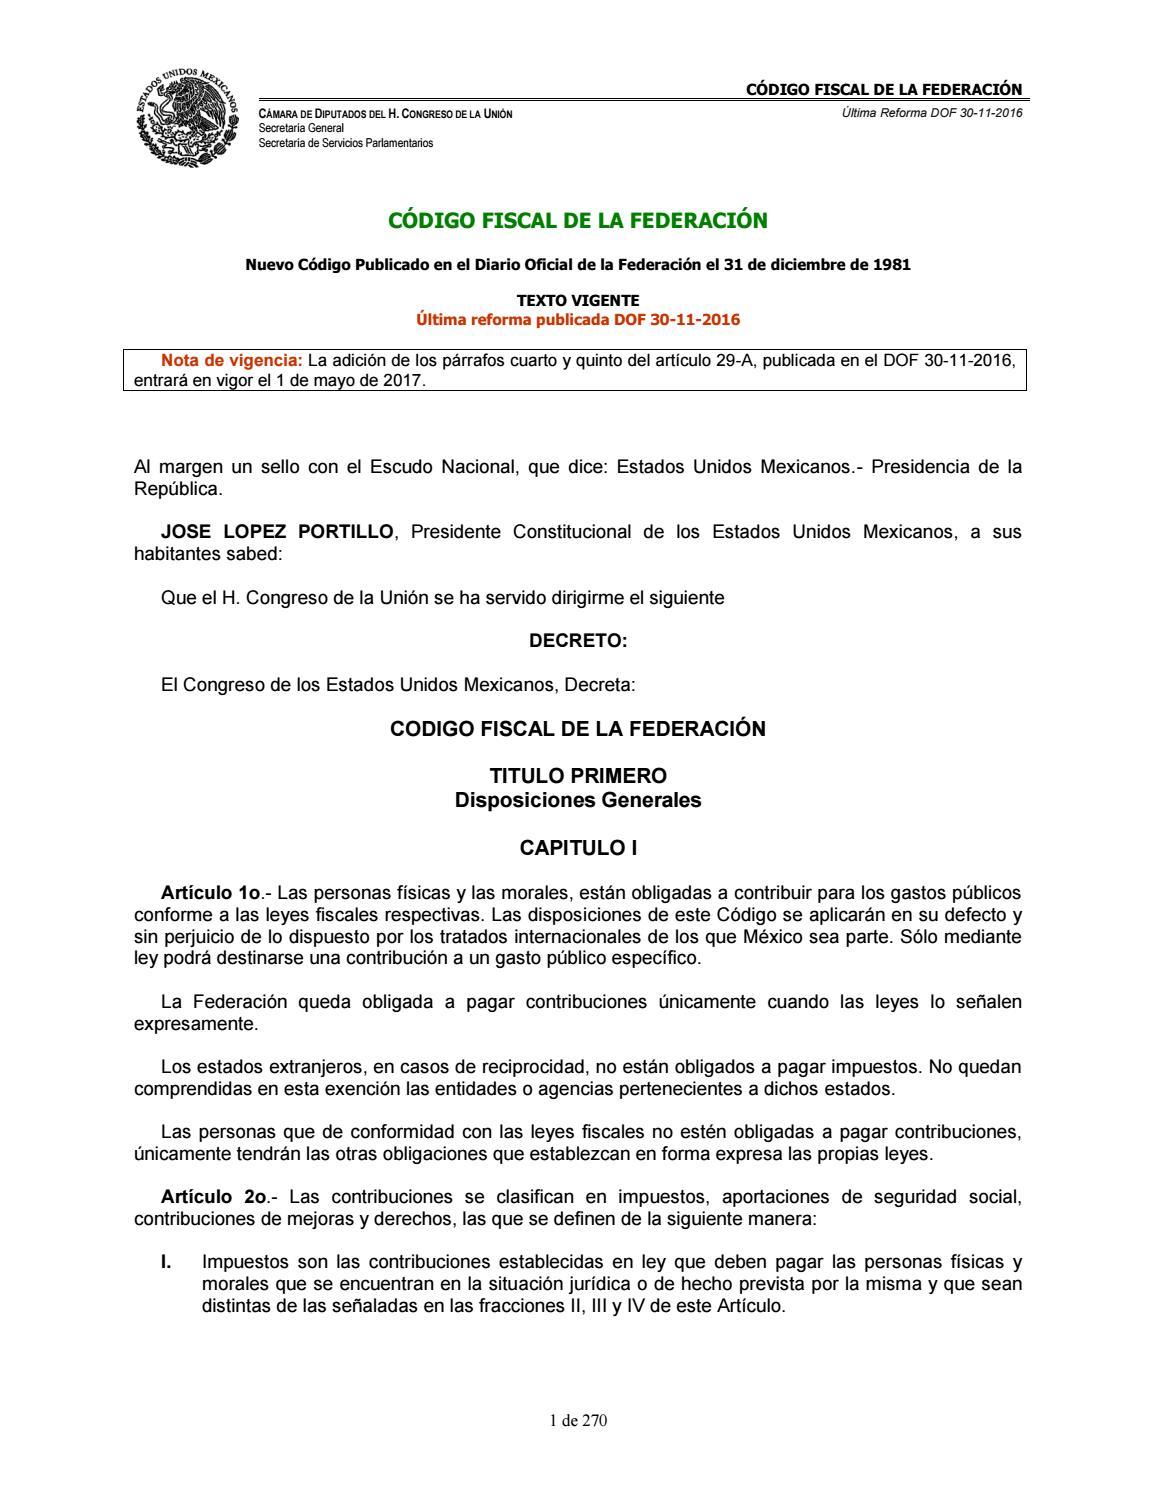 Codigo Fiscal de la Federacion by Nataly Aguilar - issuu